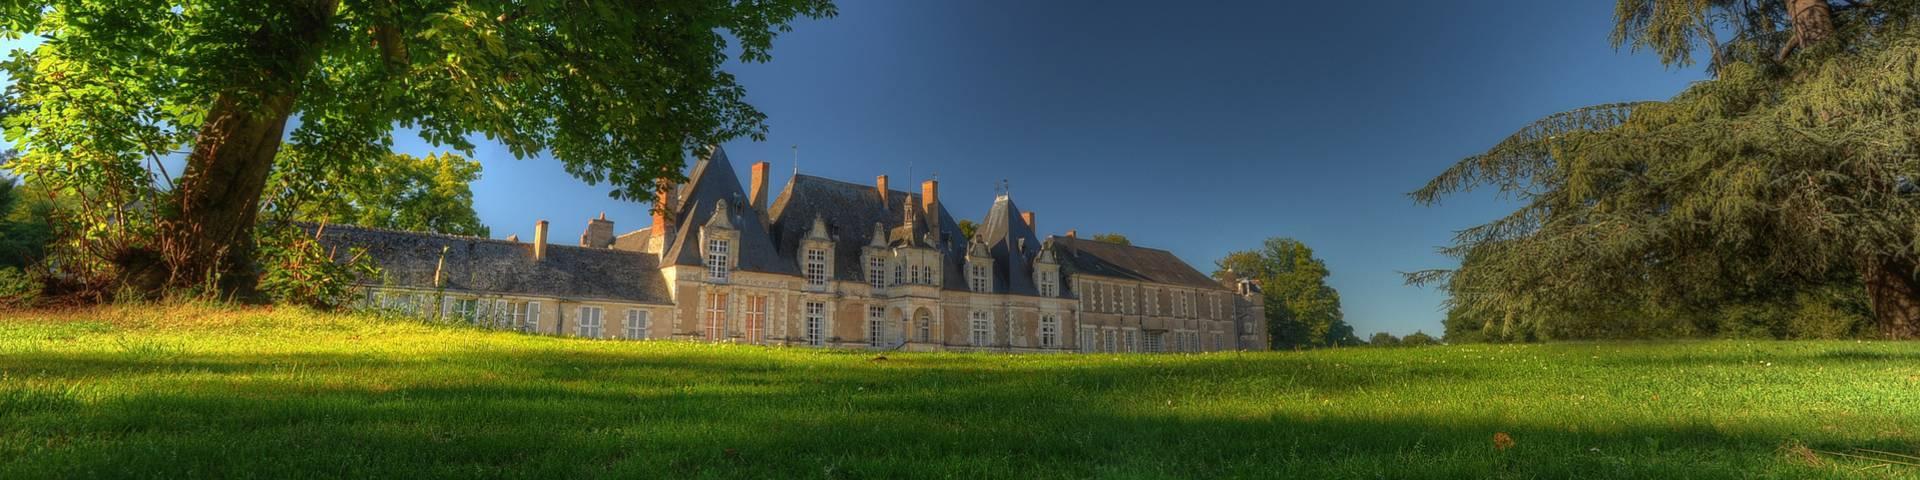 Le château de Villesavin. © L. de Serres